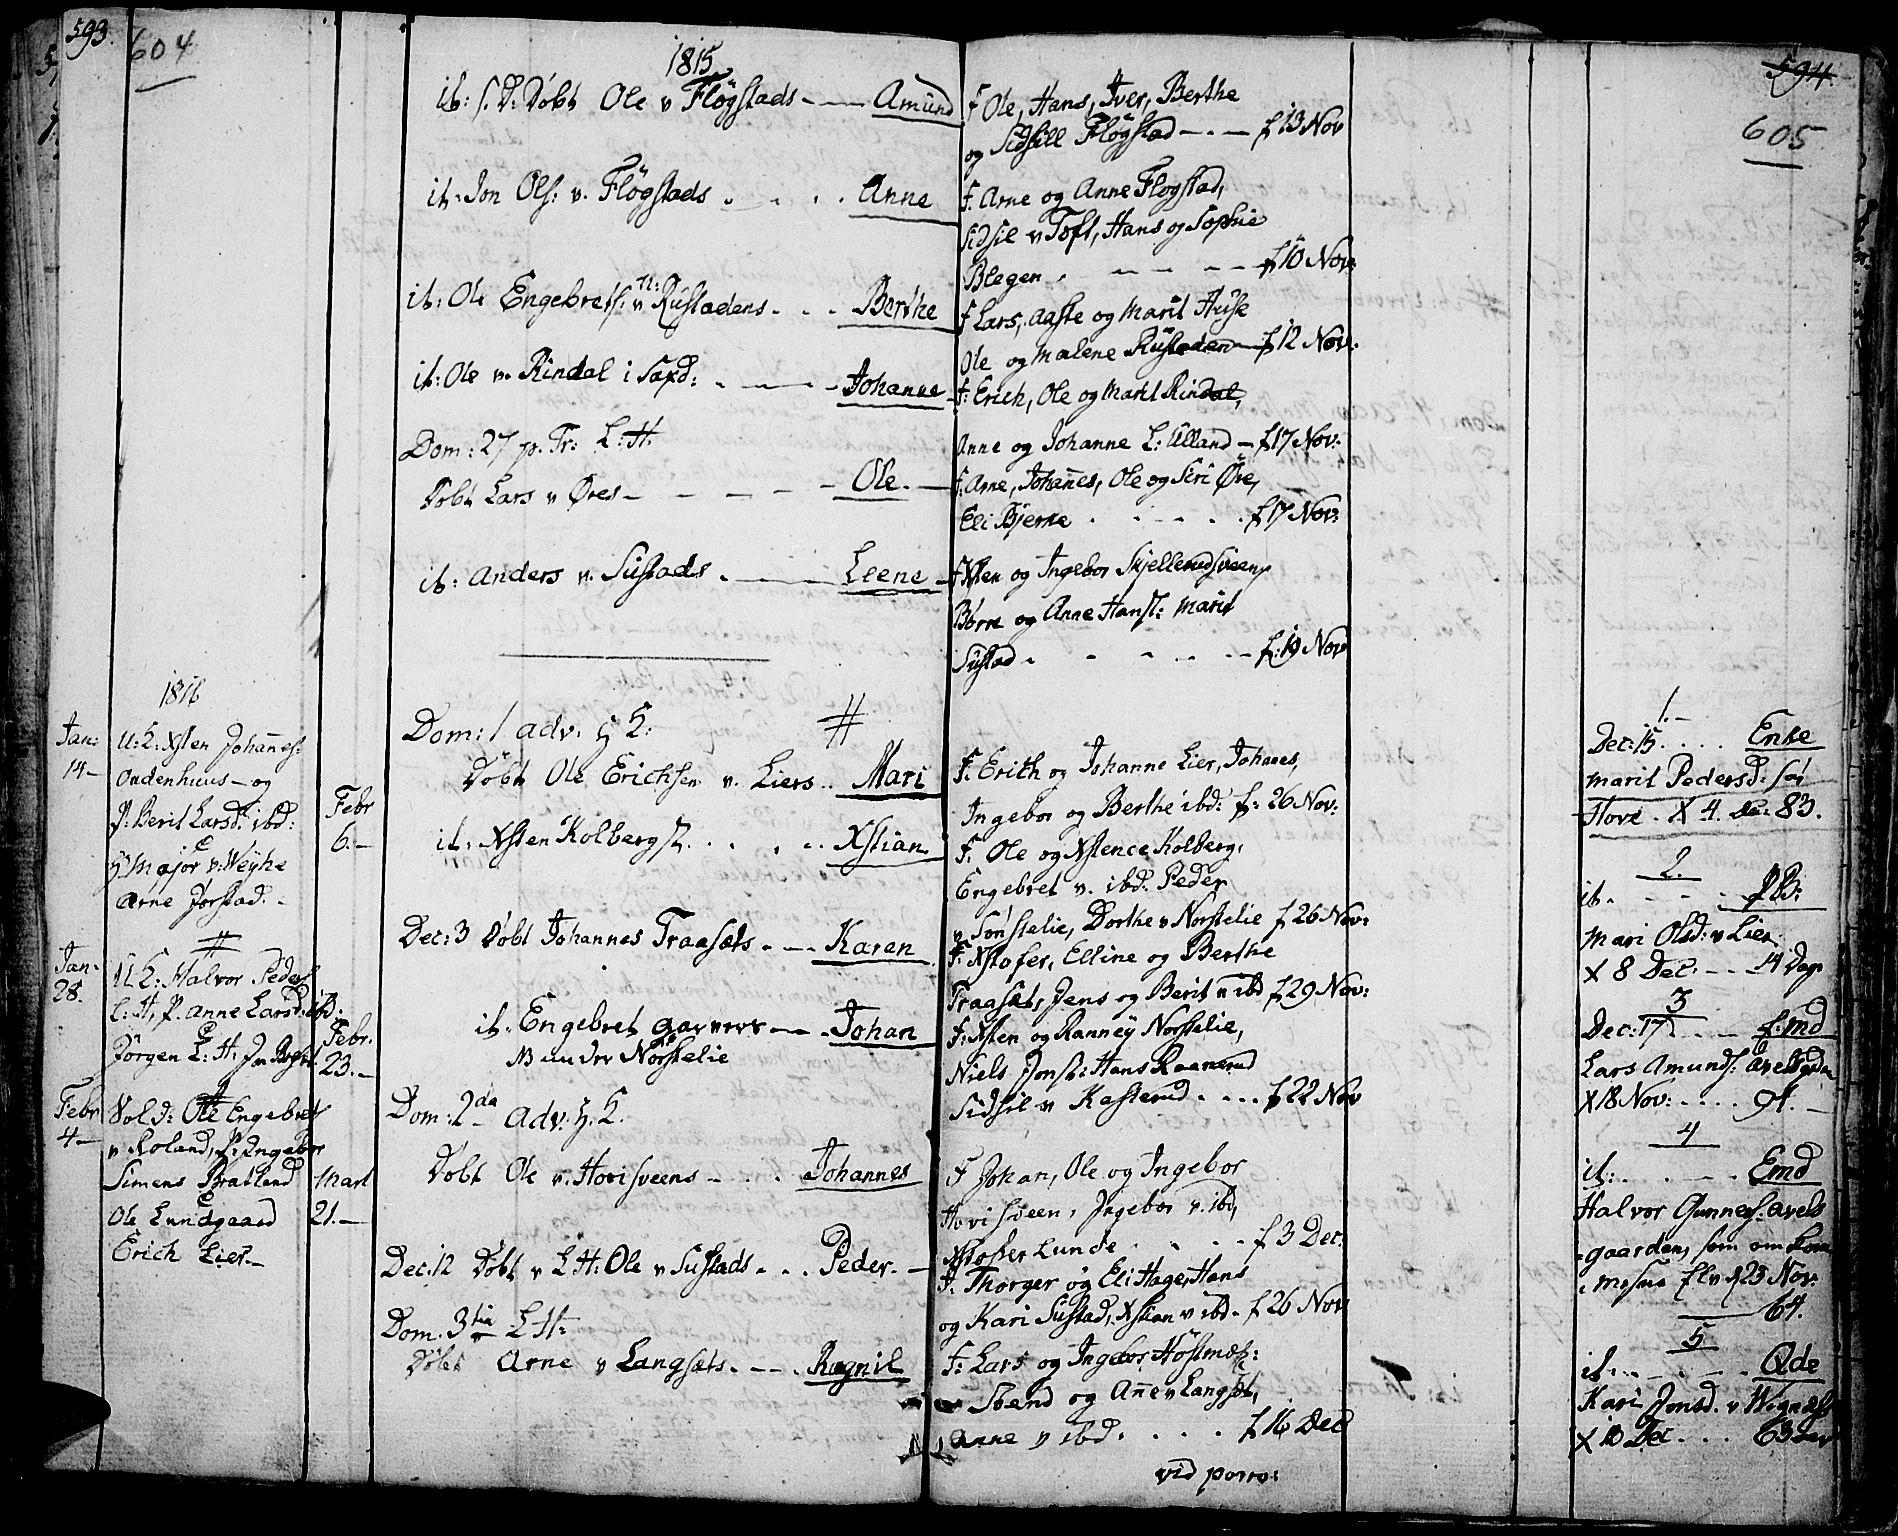 SAH, Fåberg prestekontor, Ministerialbok nr. 2, 1775-1818, s. 604-605